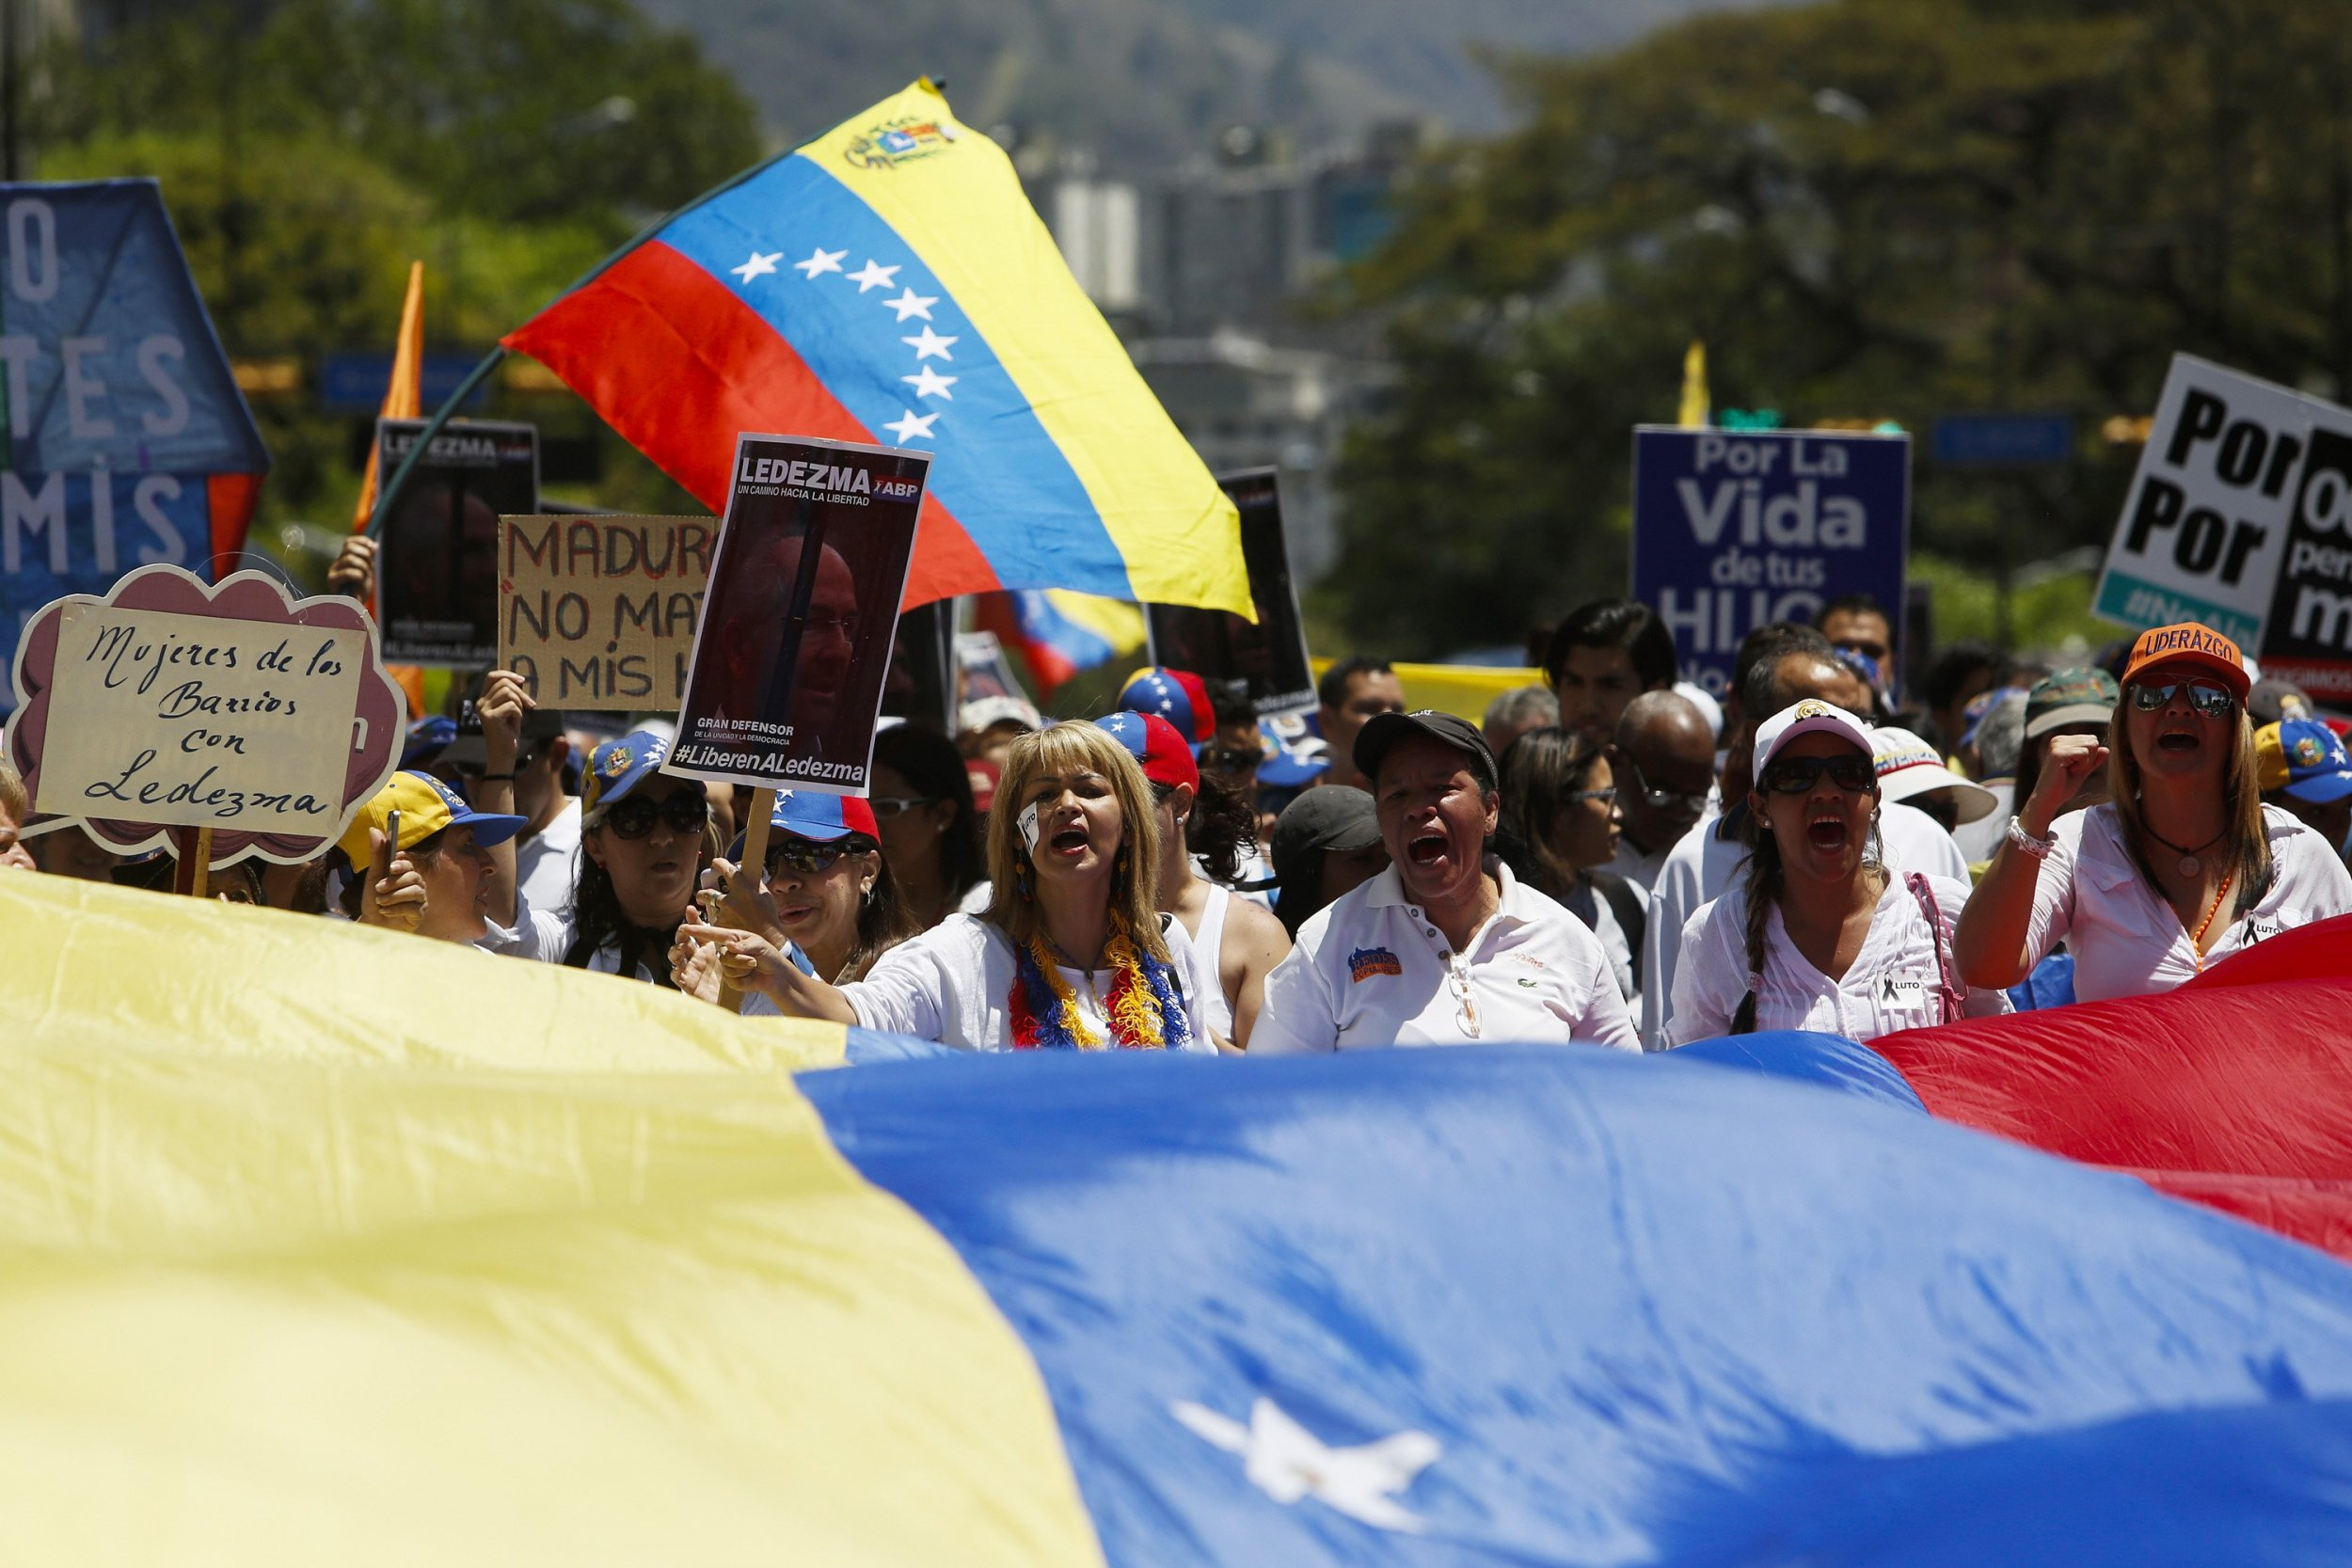 2015-03-09T163221Z_1_LYNXMPEB280SC_RTROPTP_4_VENEZUELA-POLITICS